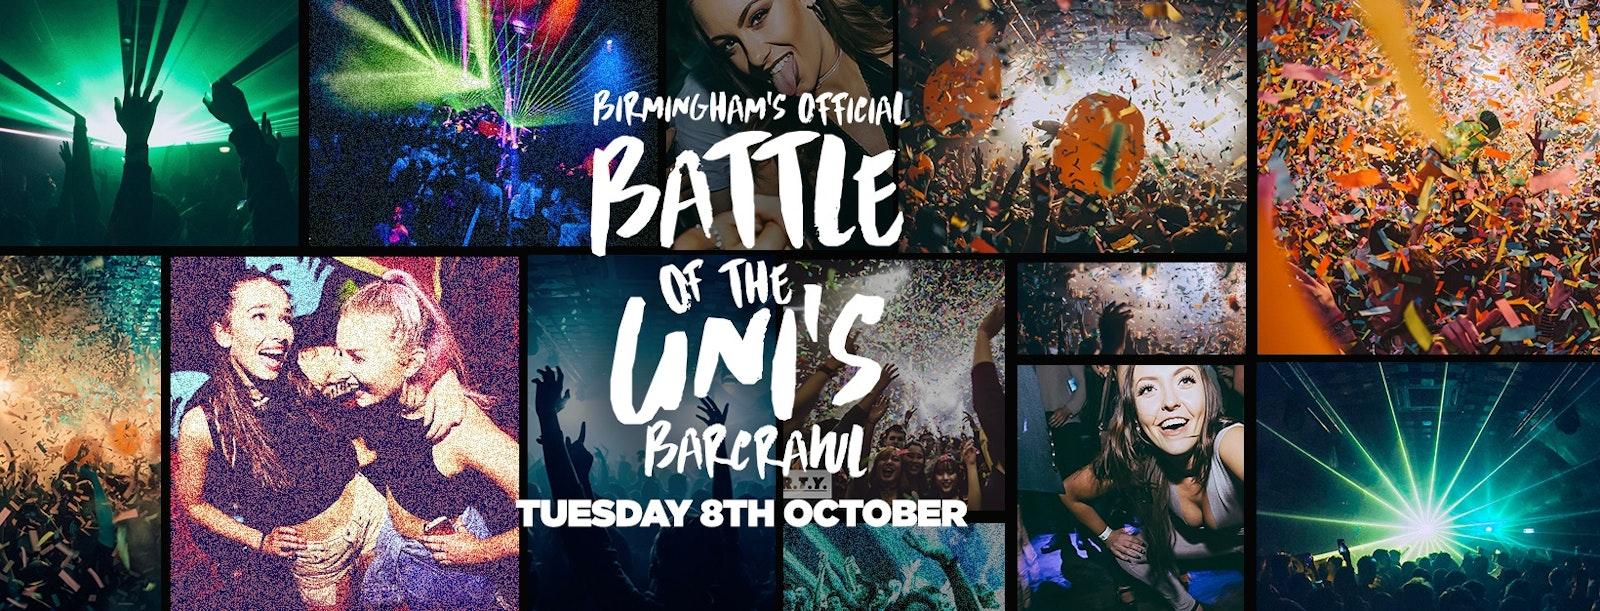 Battle Of The Unis Bar Crawl